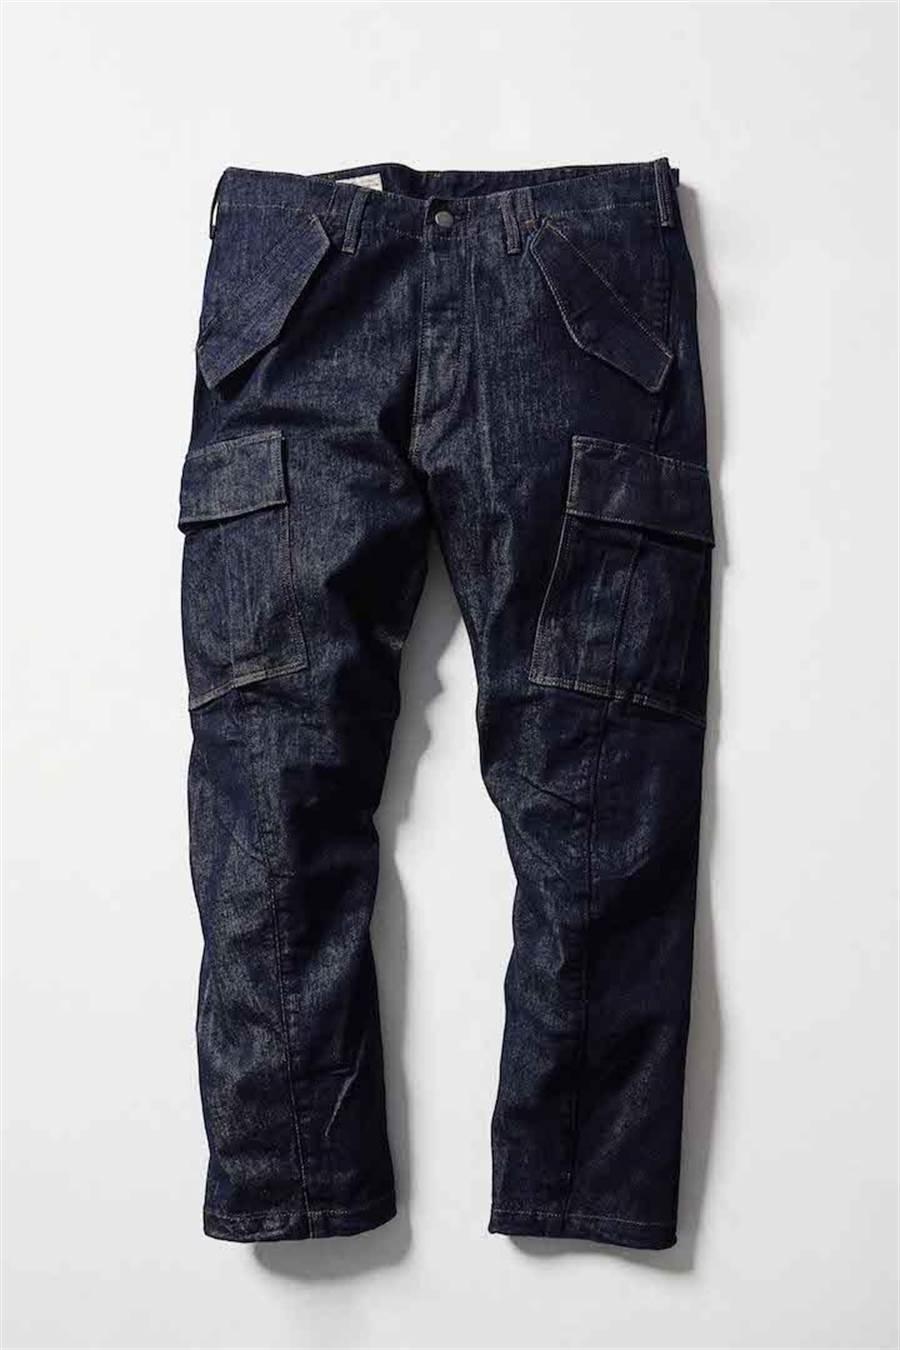 LEVI'S ENGINEERED JEANS 3D CARGO丹寧工裝褲,4390元。 (LEVI'S提供)